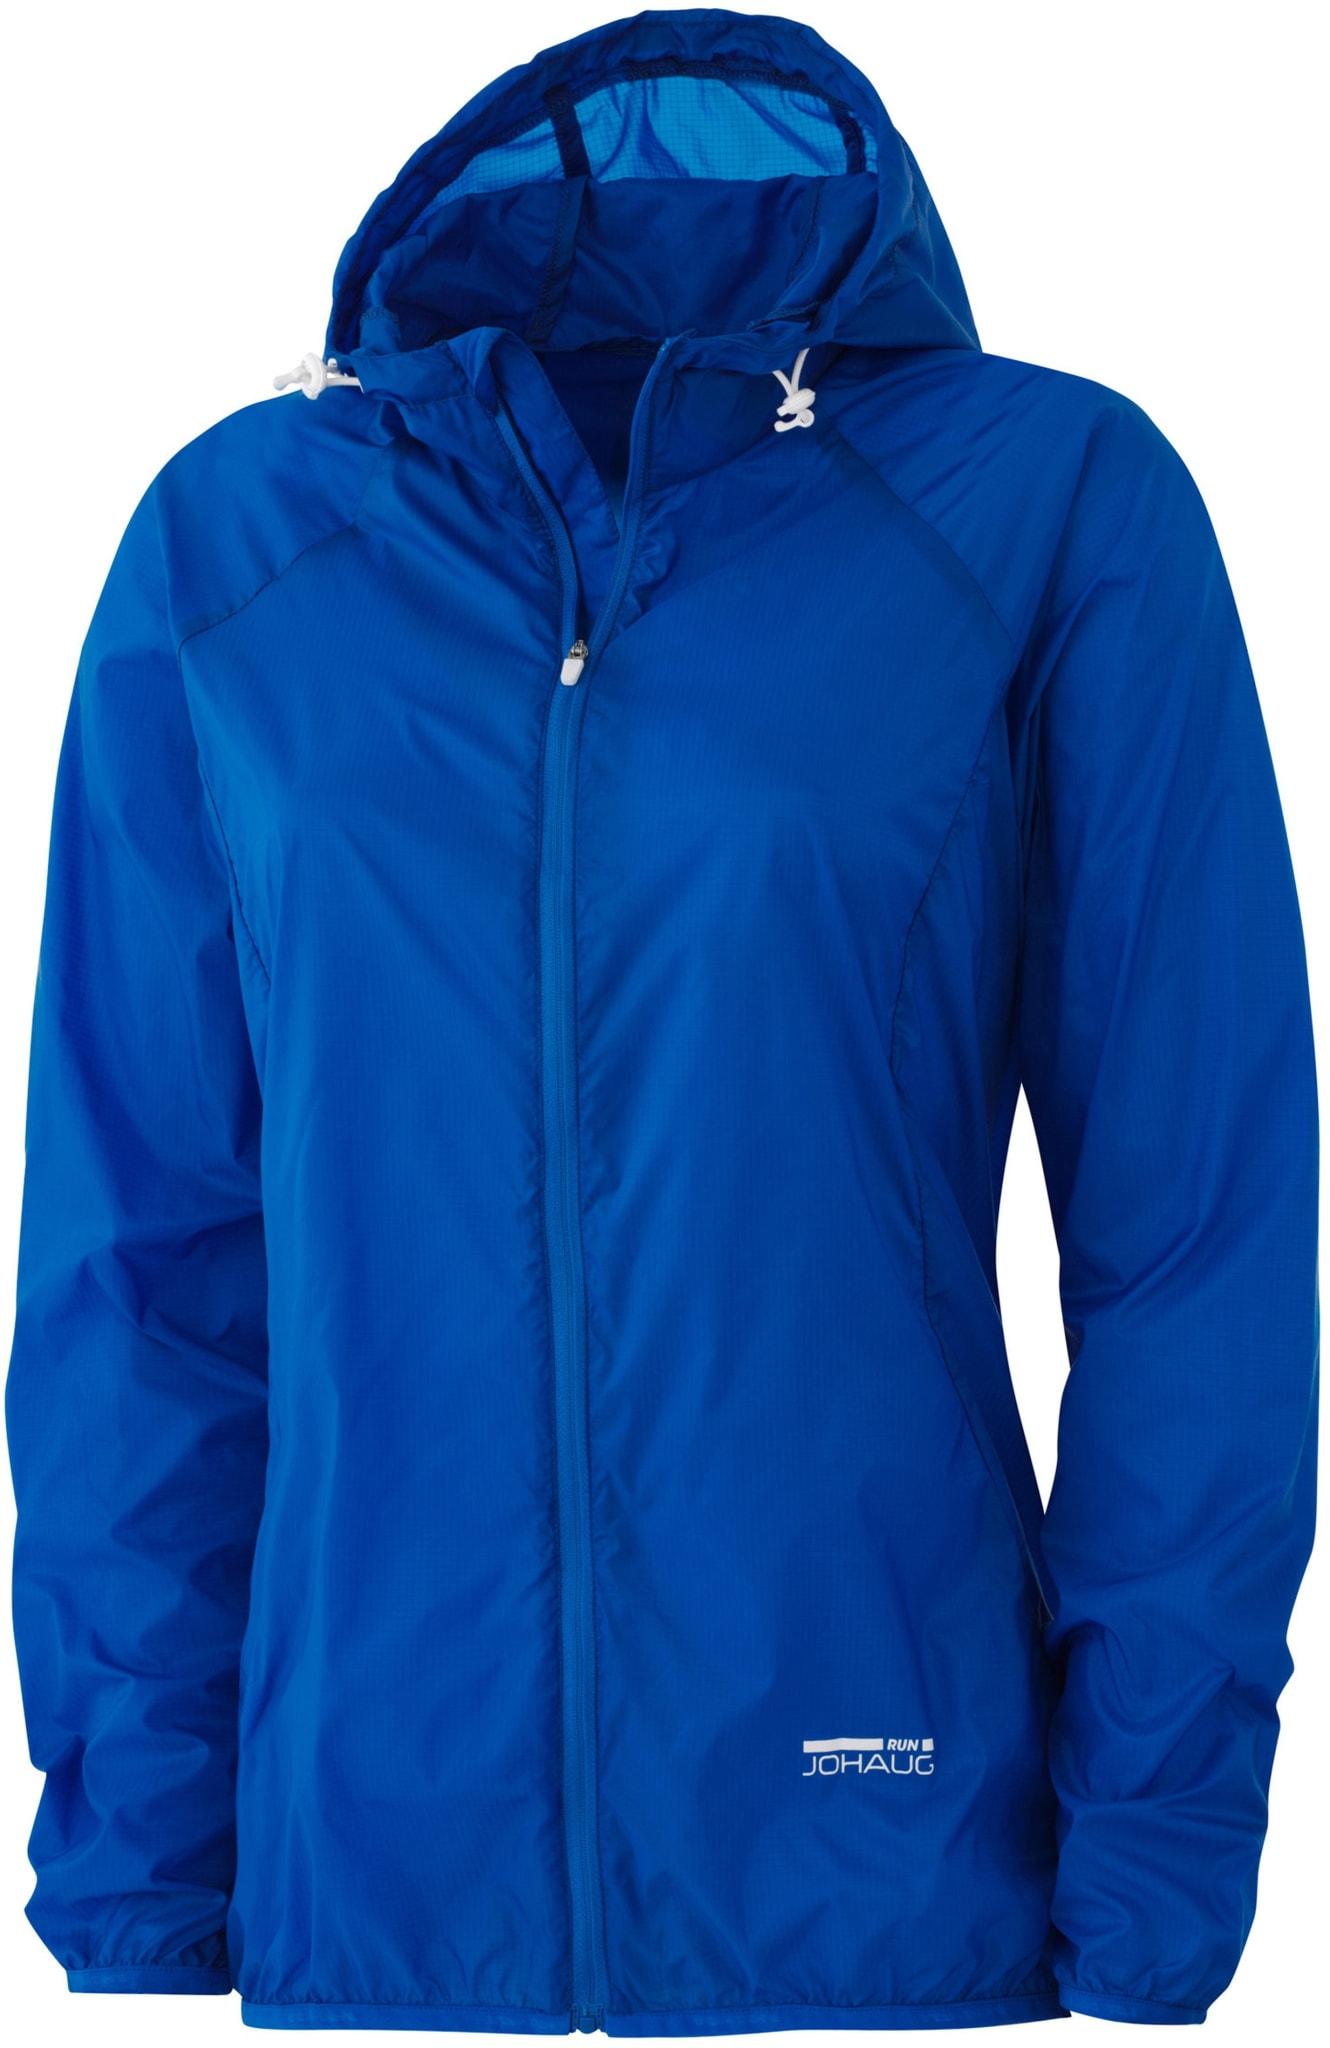 RUN Light Shell Jacket